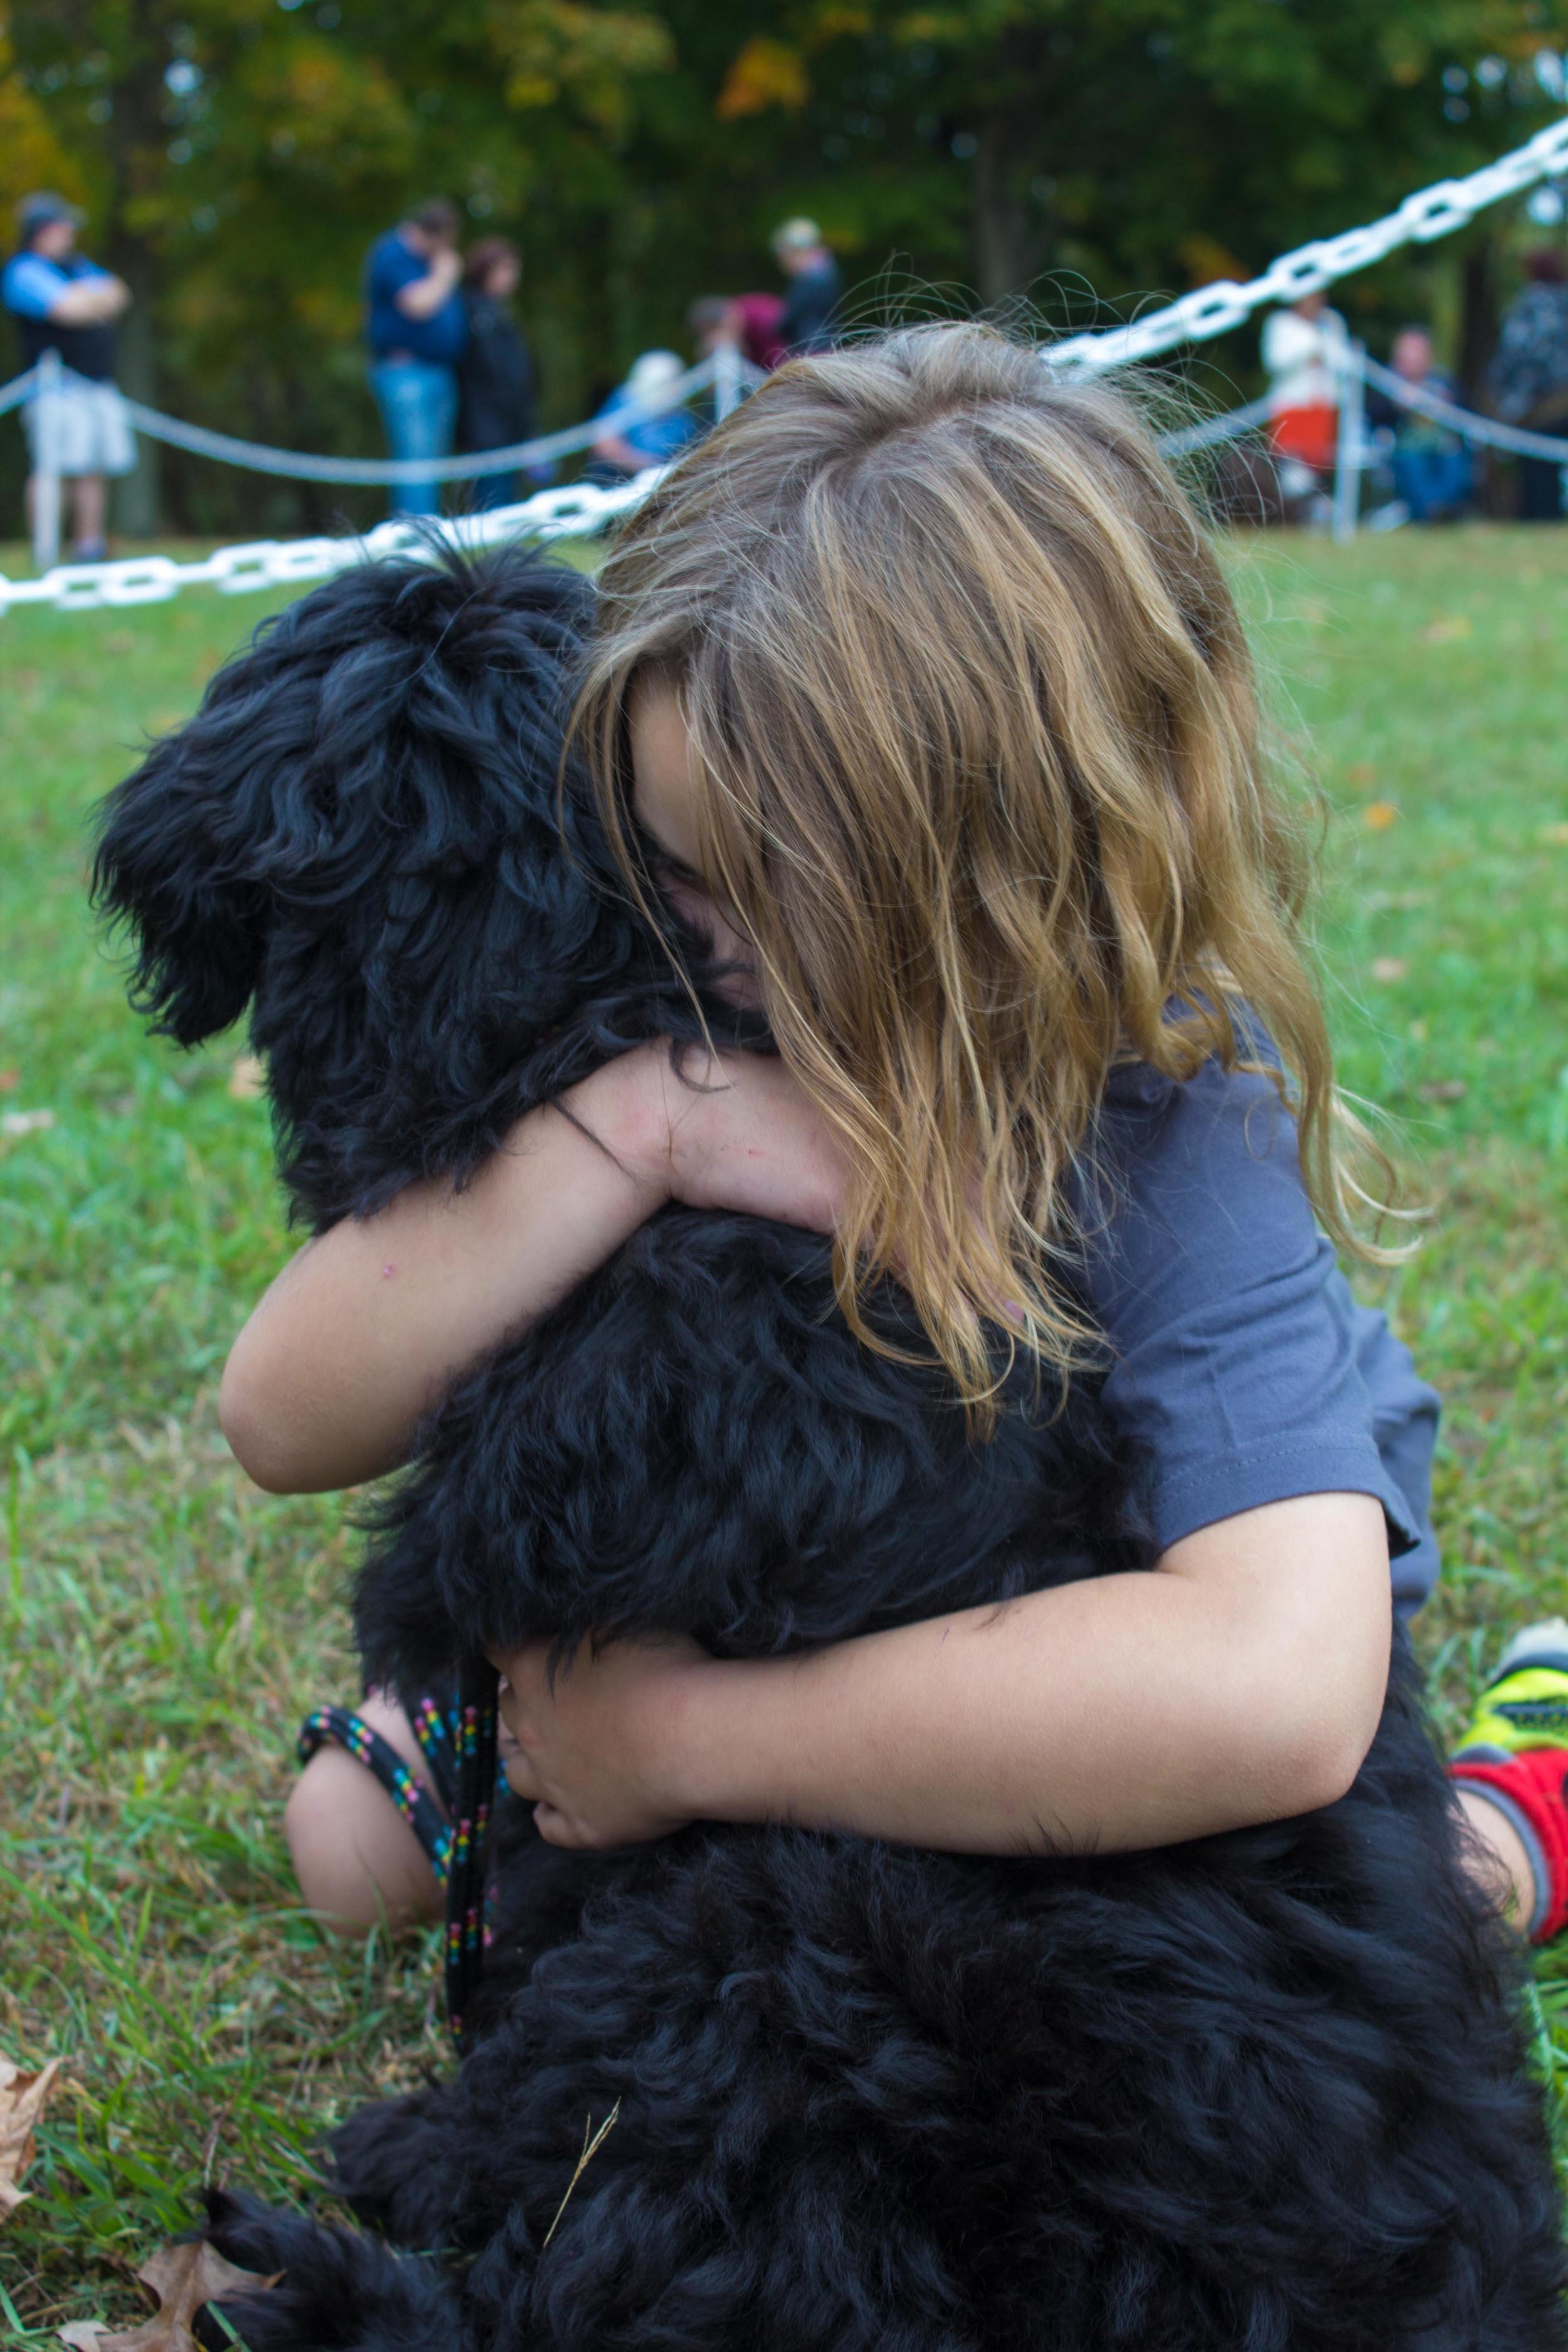 20131012 - DogShow-66.jpg